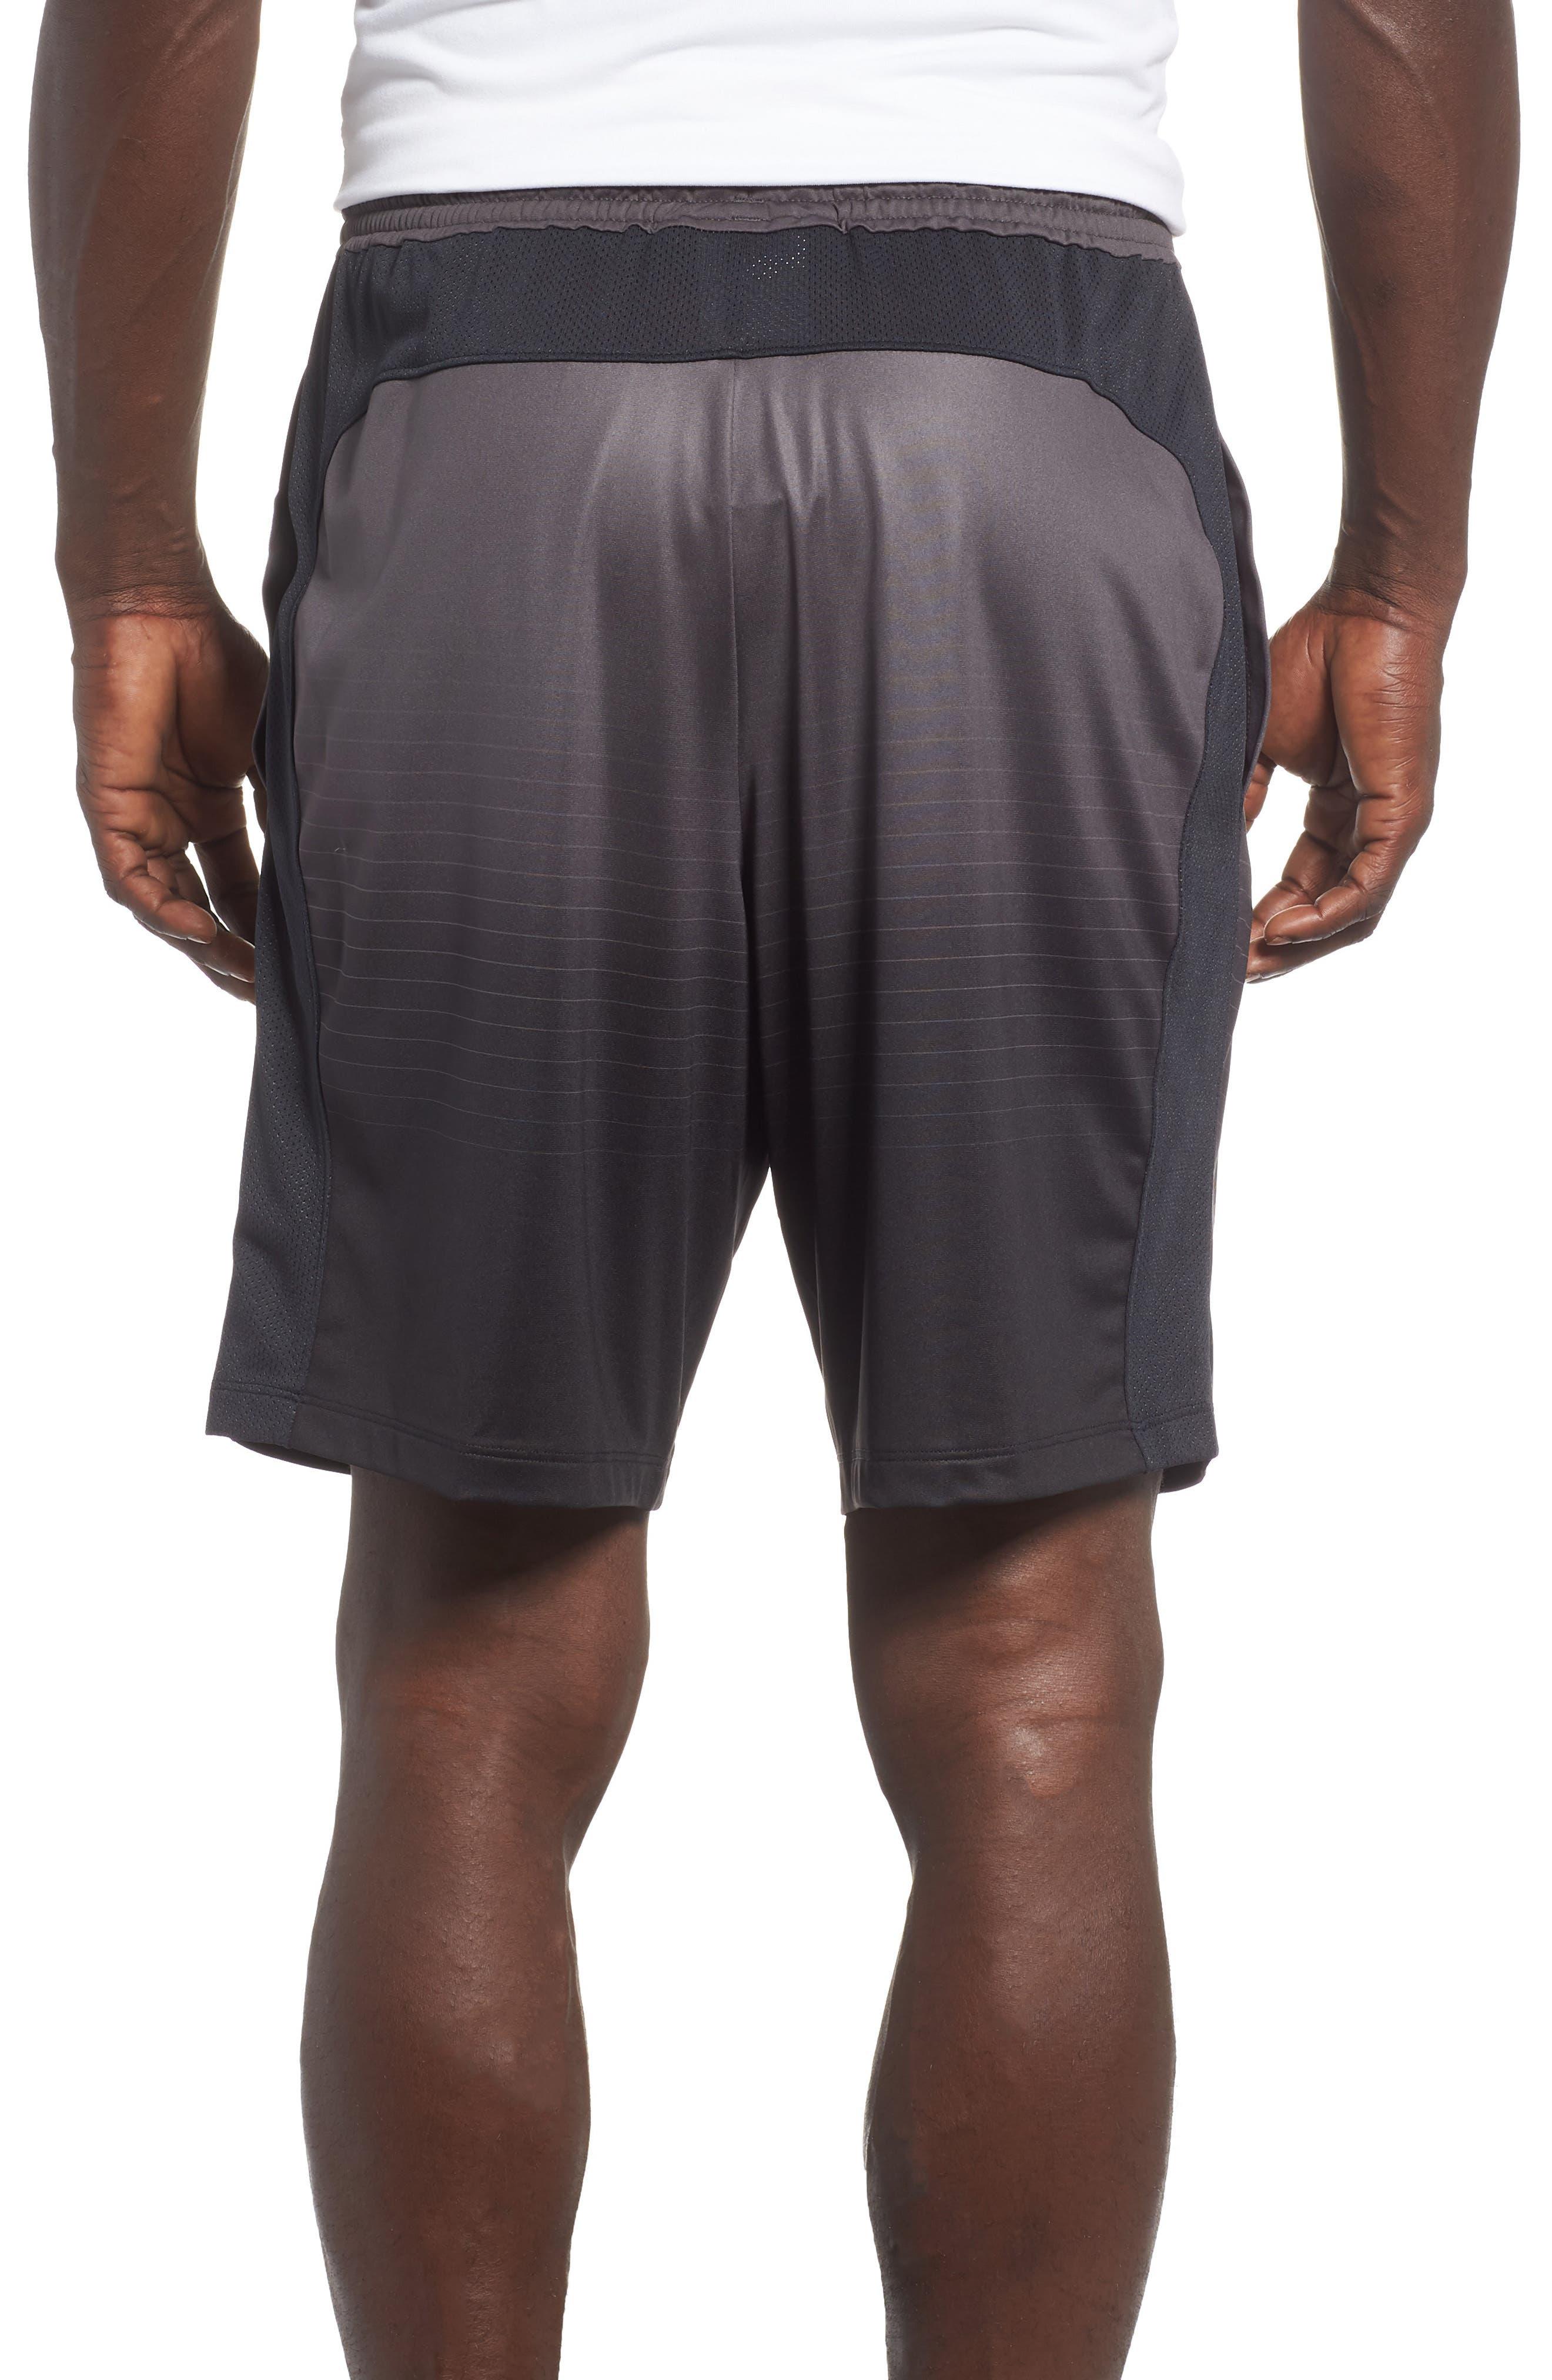 MK-1 Fade Shorts,                             Alternate thumbnail 2, color,                             CHARCOAL